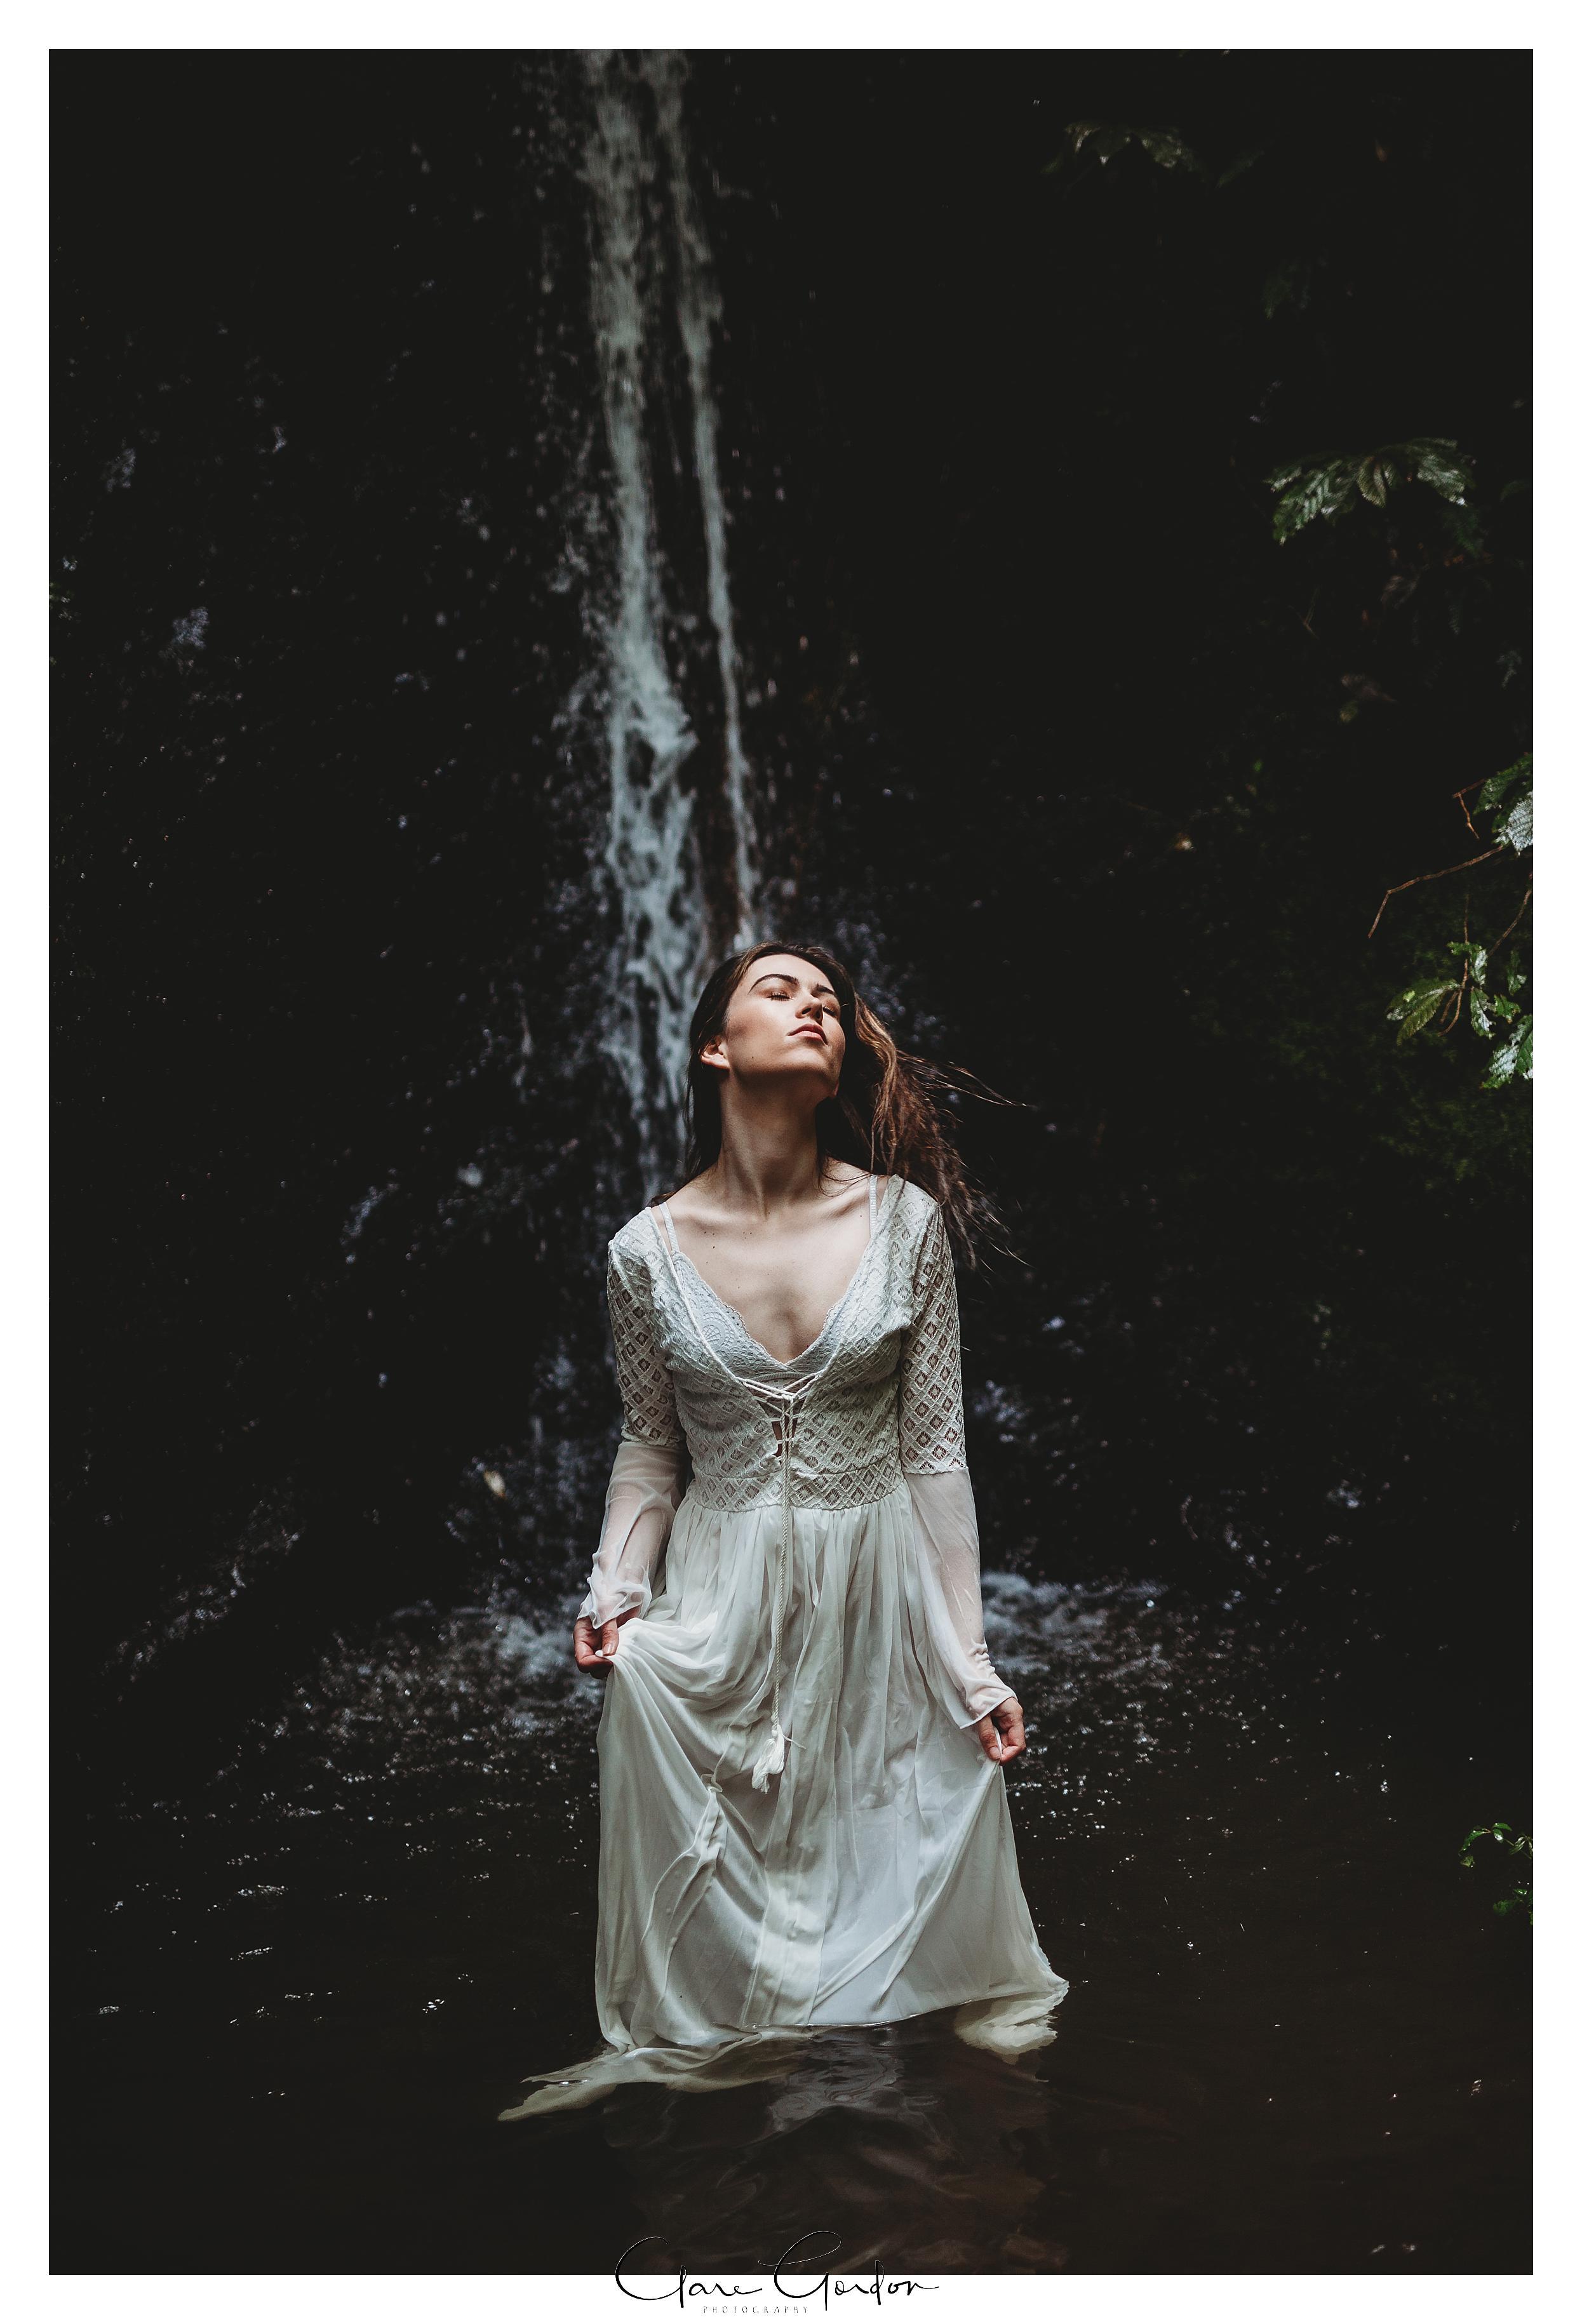 boho-bride-Shoot-Waikato-Wedding-photography-Girl-in Waterfall -New Zealand-wedding (2).jpg